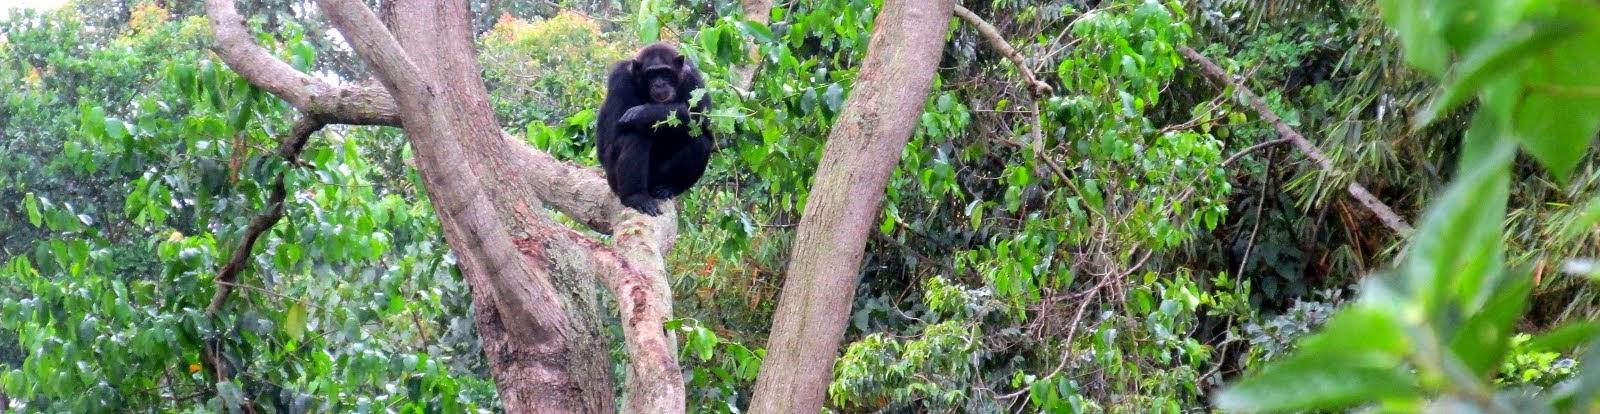 Chimpanzee (Entebbe, Uganda)